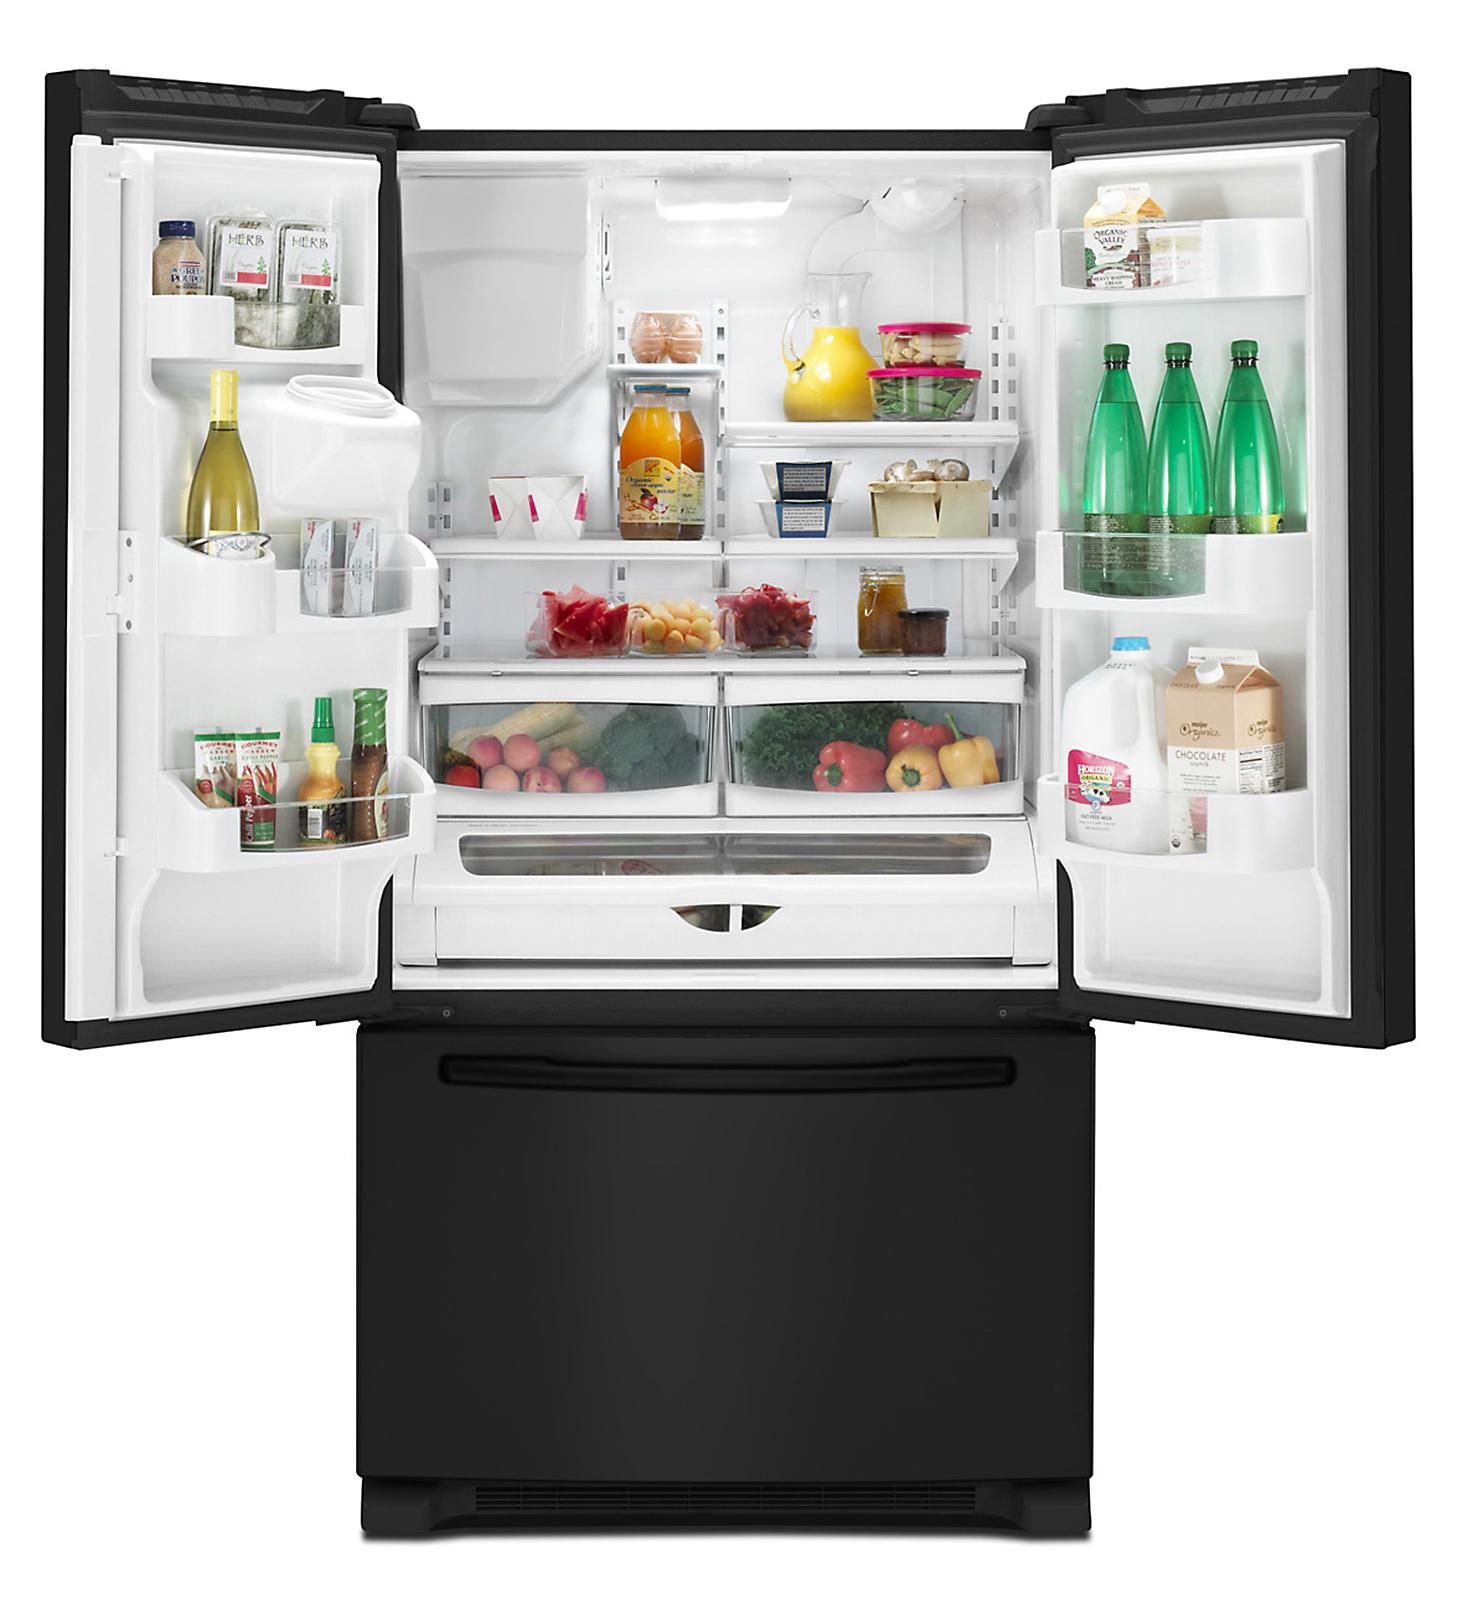 Maytag 25.5 cu. ft. French Door Bottom Freezer Refrigerator